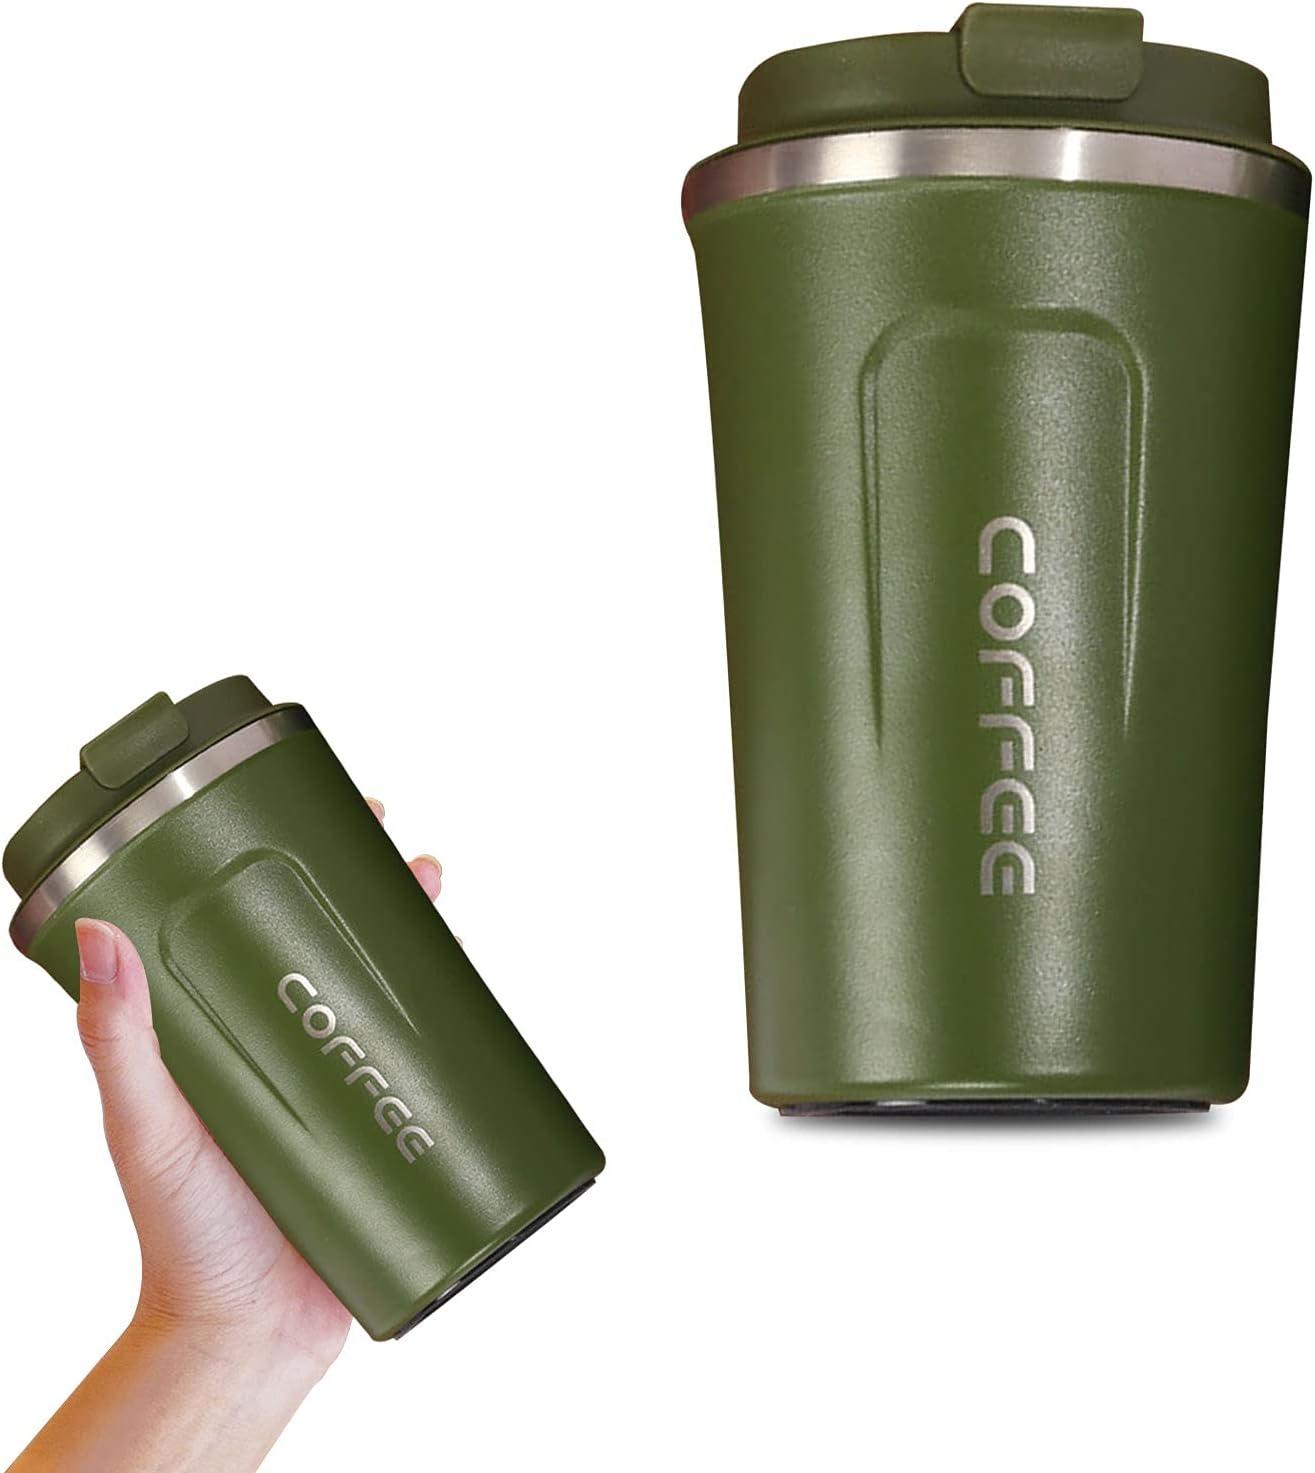 HOSPAOP Taza de café To Go de 380 ml, termo de acero inoxidable con tapa, Travel Mug para café y té, termo a prueba de fugas, taza de viaje (verde militar)